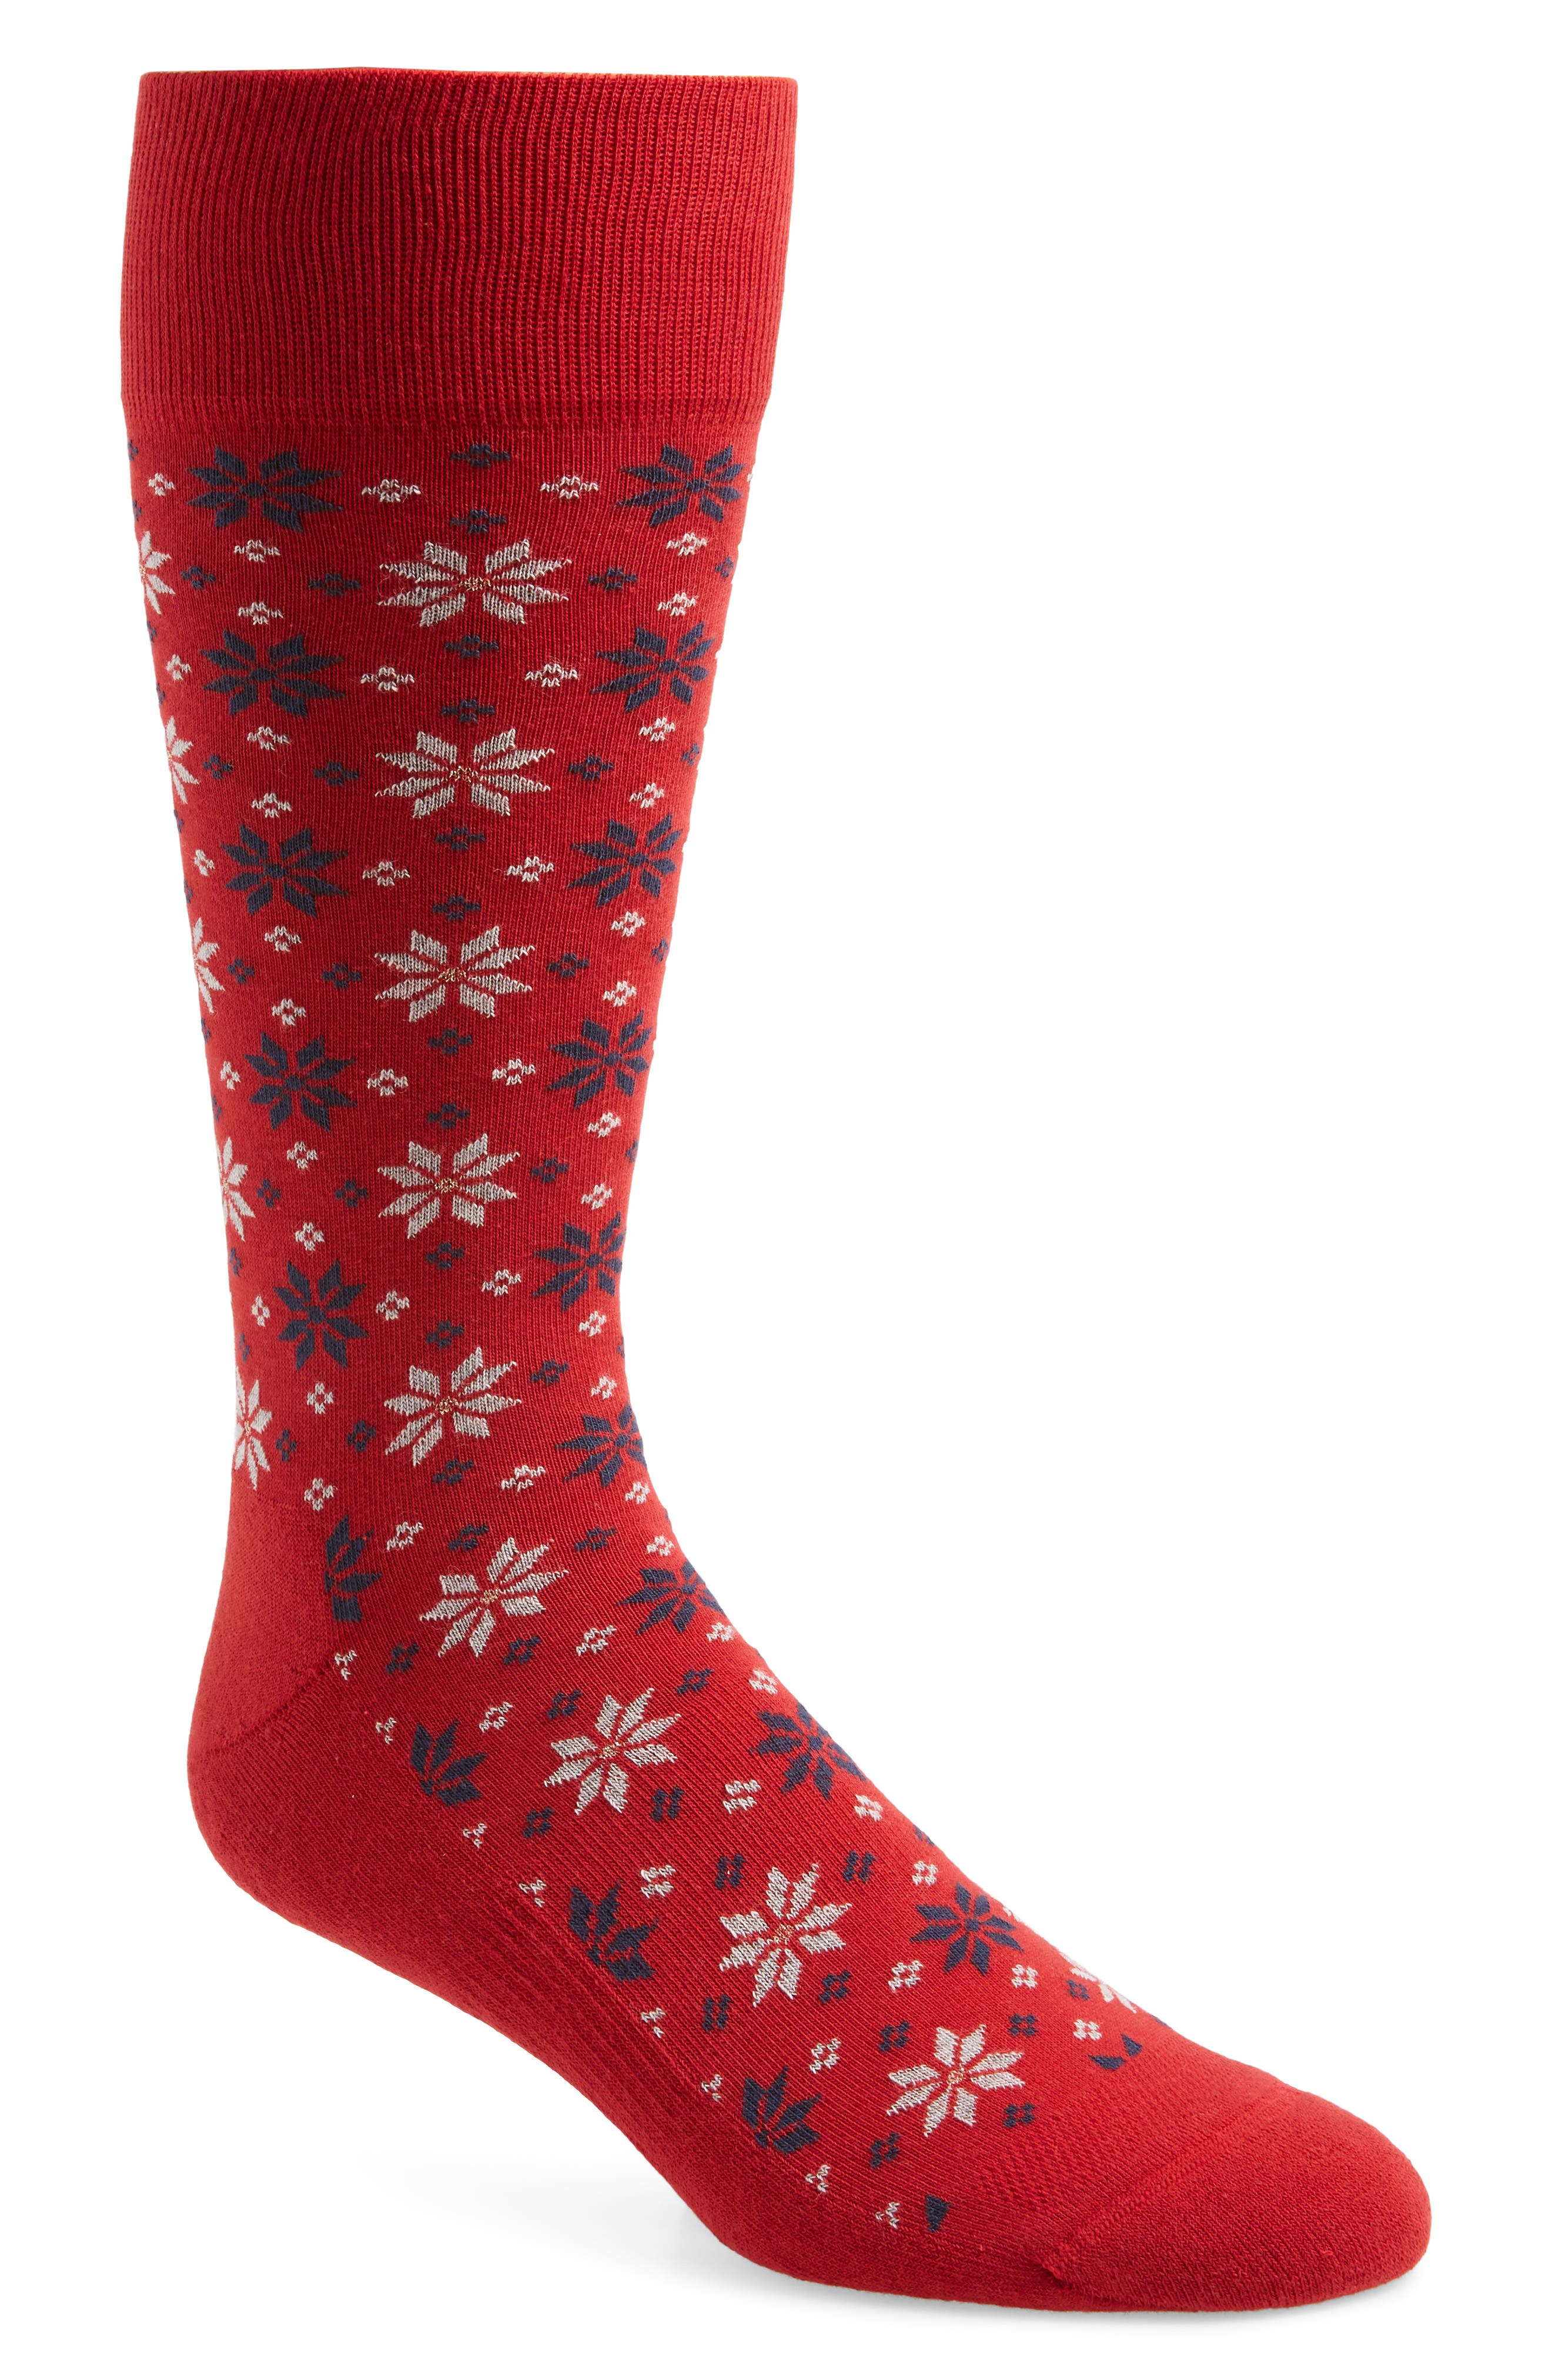 Holiday Fair Isle Socks,                         Main,                         color, RED/ NAVY